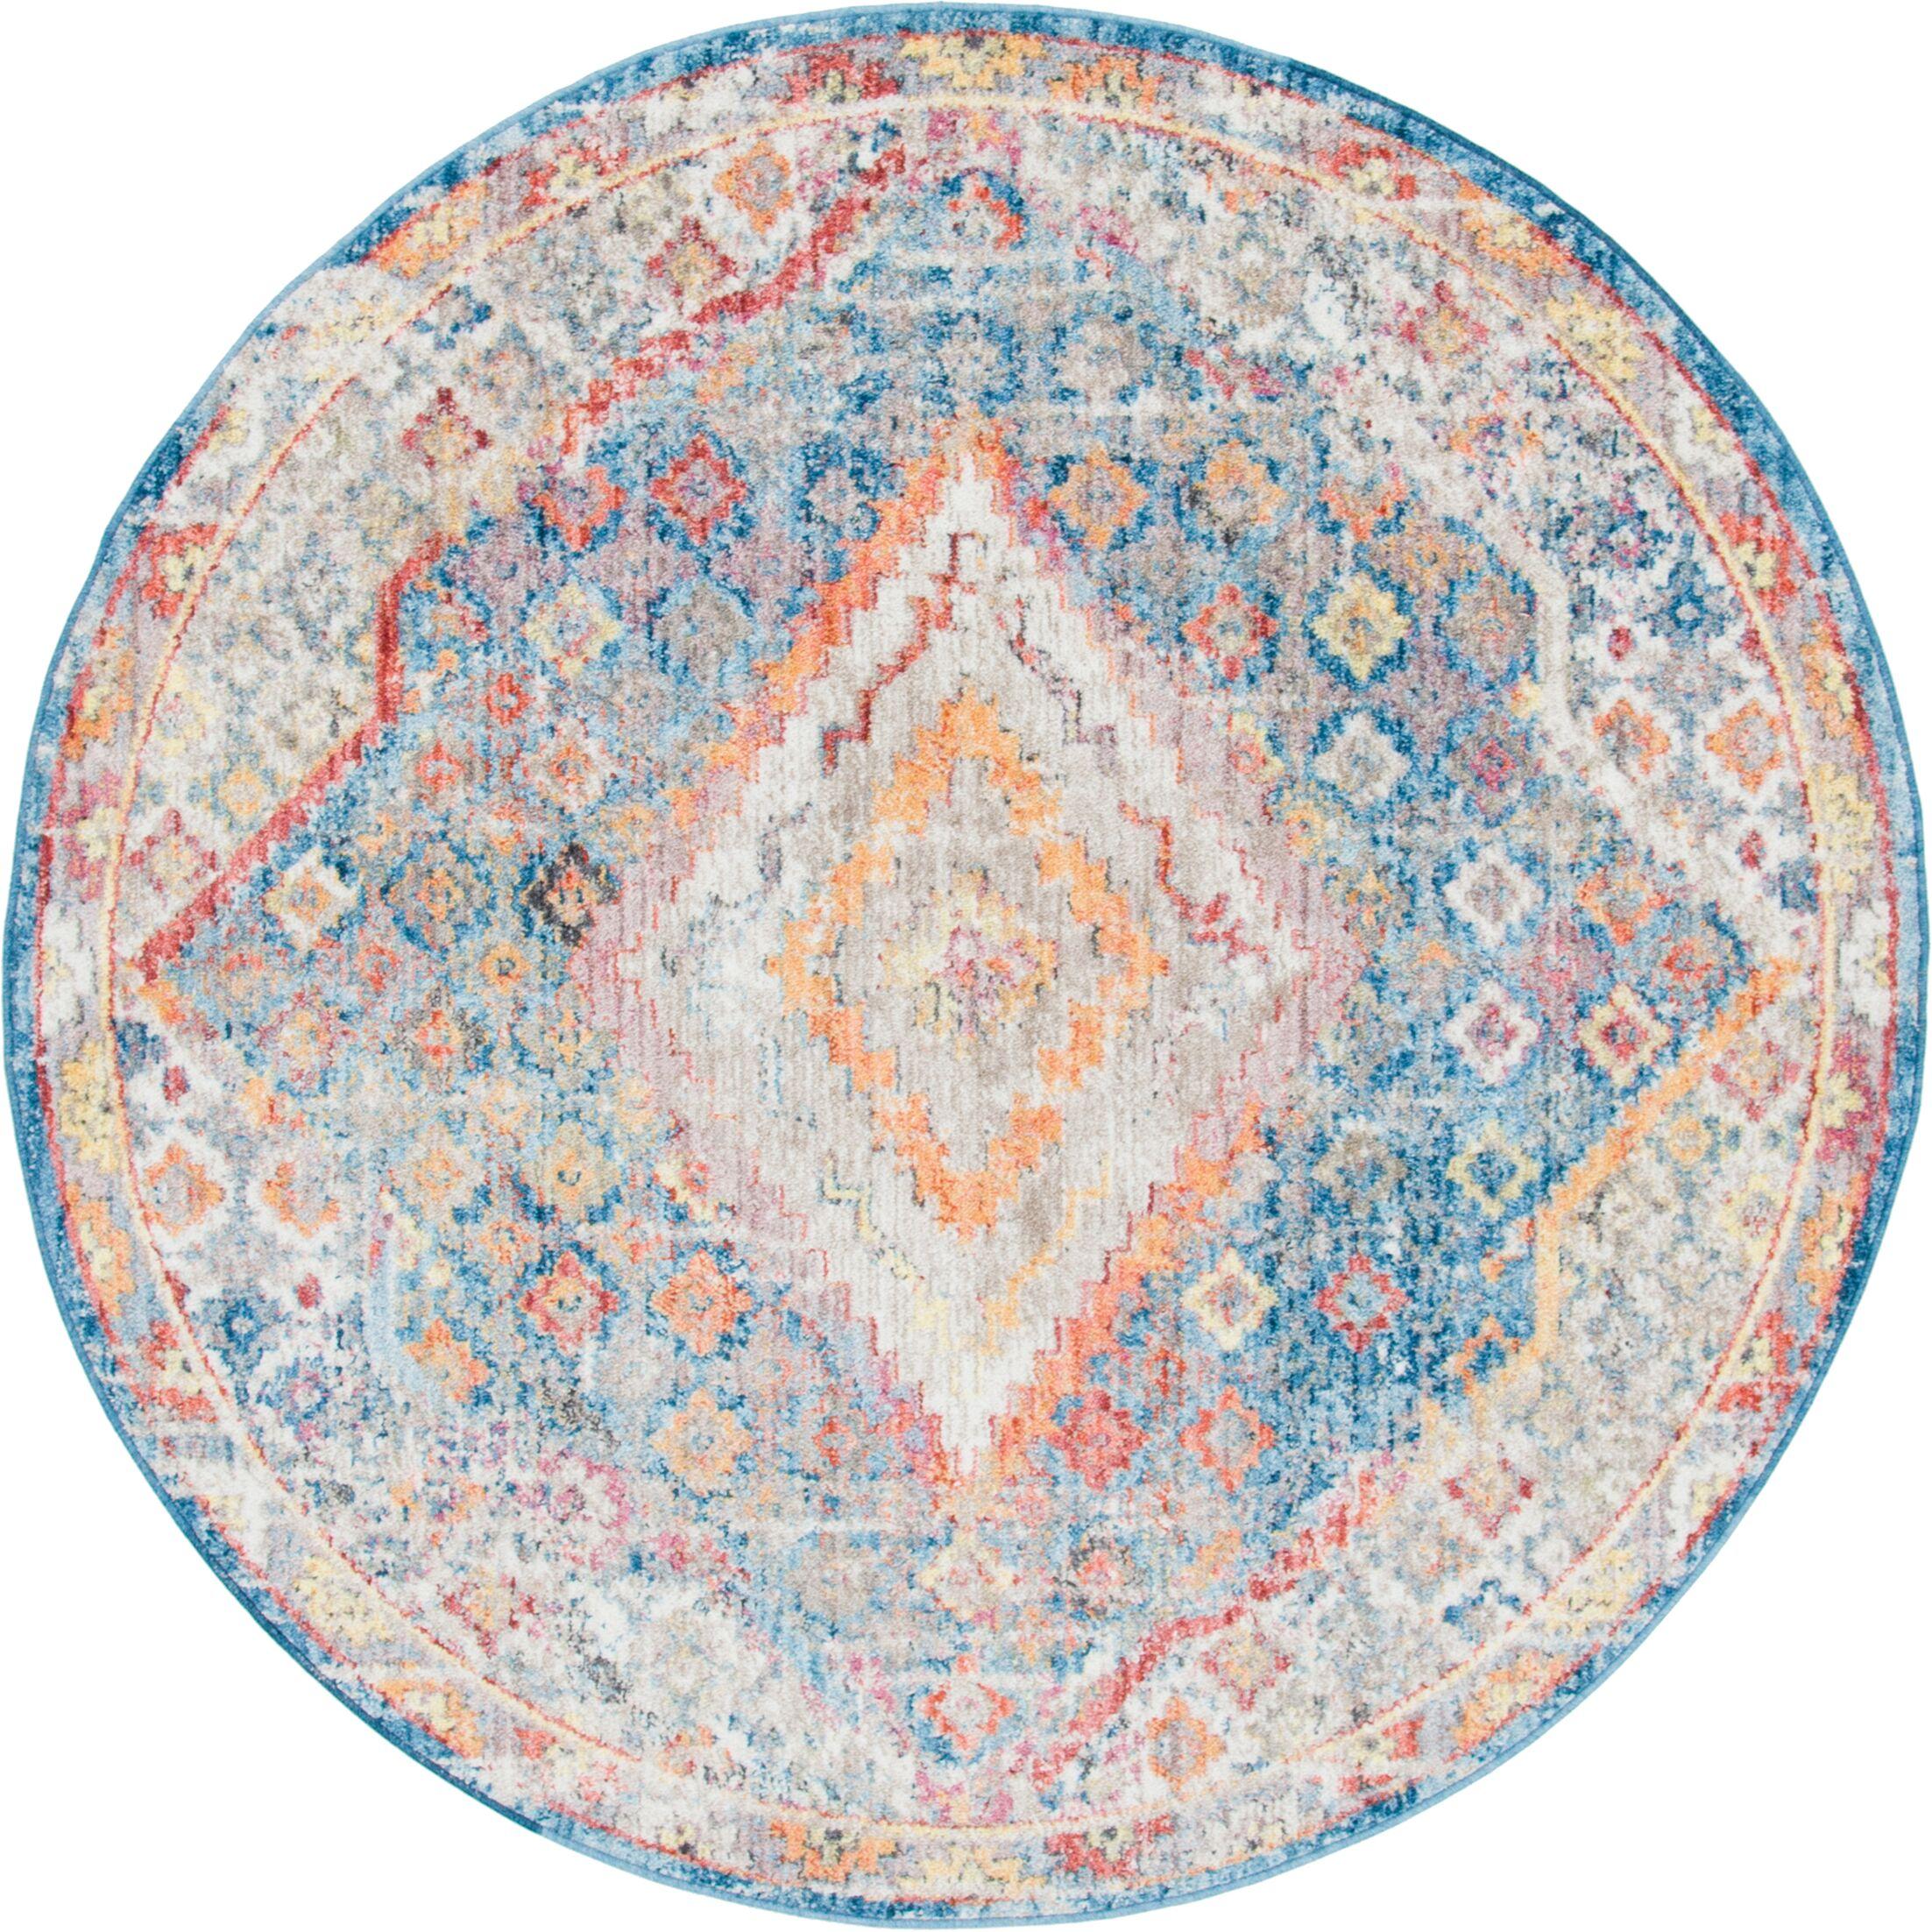 Gomez Blue/Orange Area Rug Rug Size: Round 6'